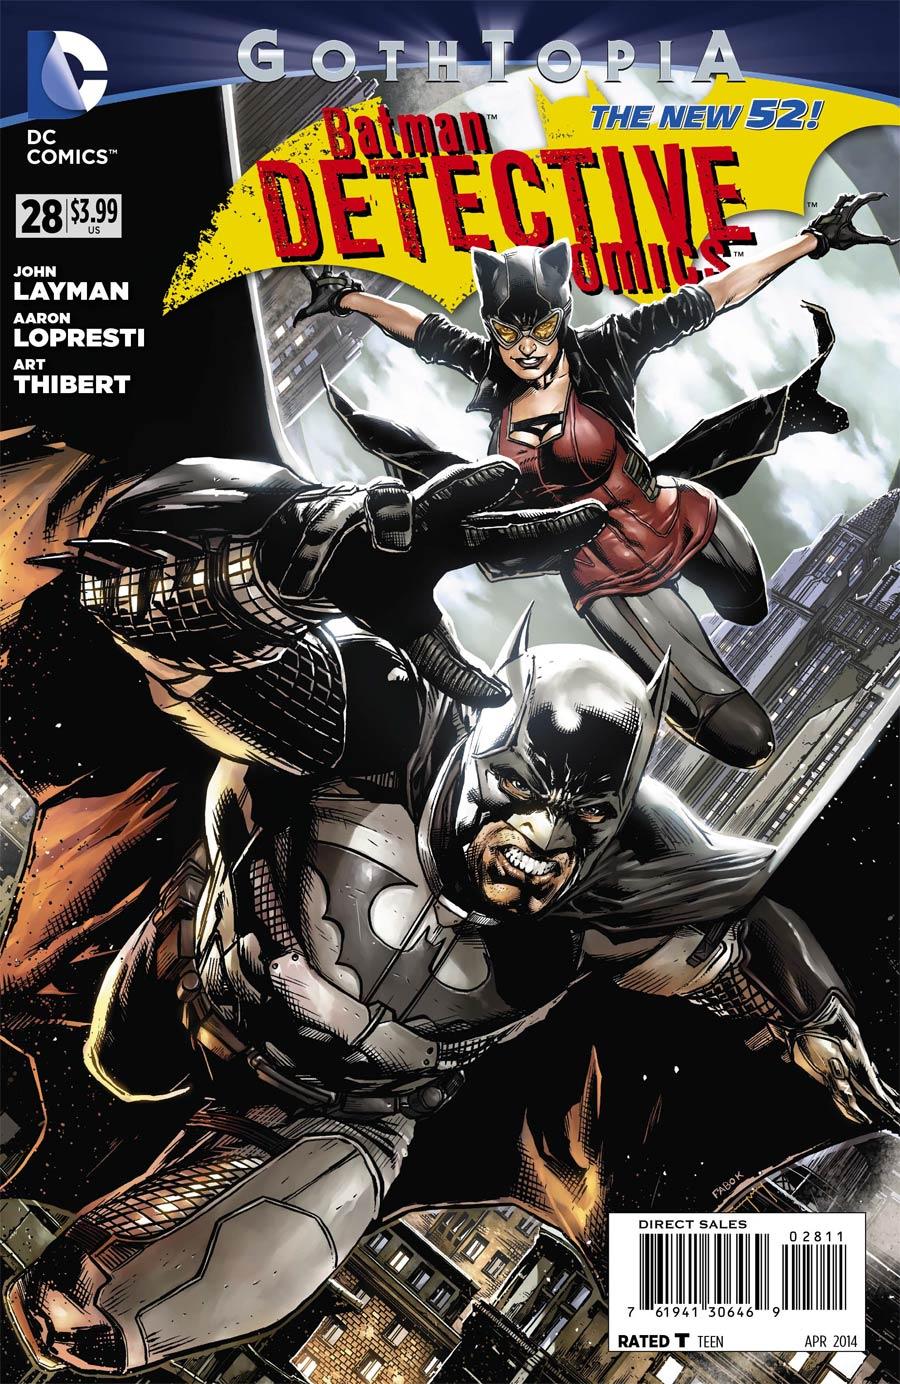 Detective Comics Vol 2 #28 Cover A Regular Jason Fabok Cover (Gothtopia Tie-In)